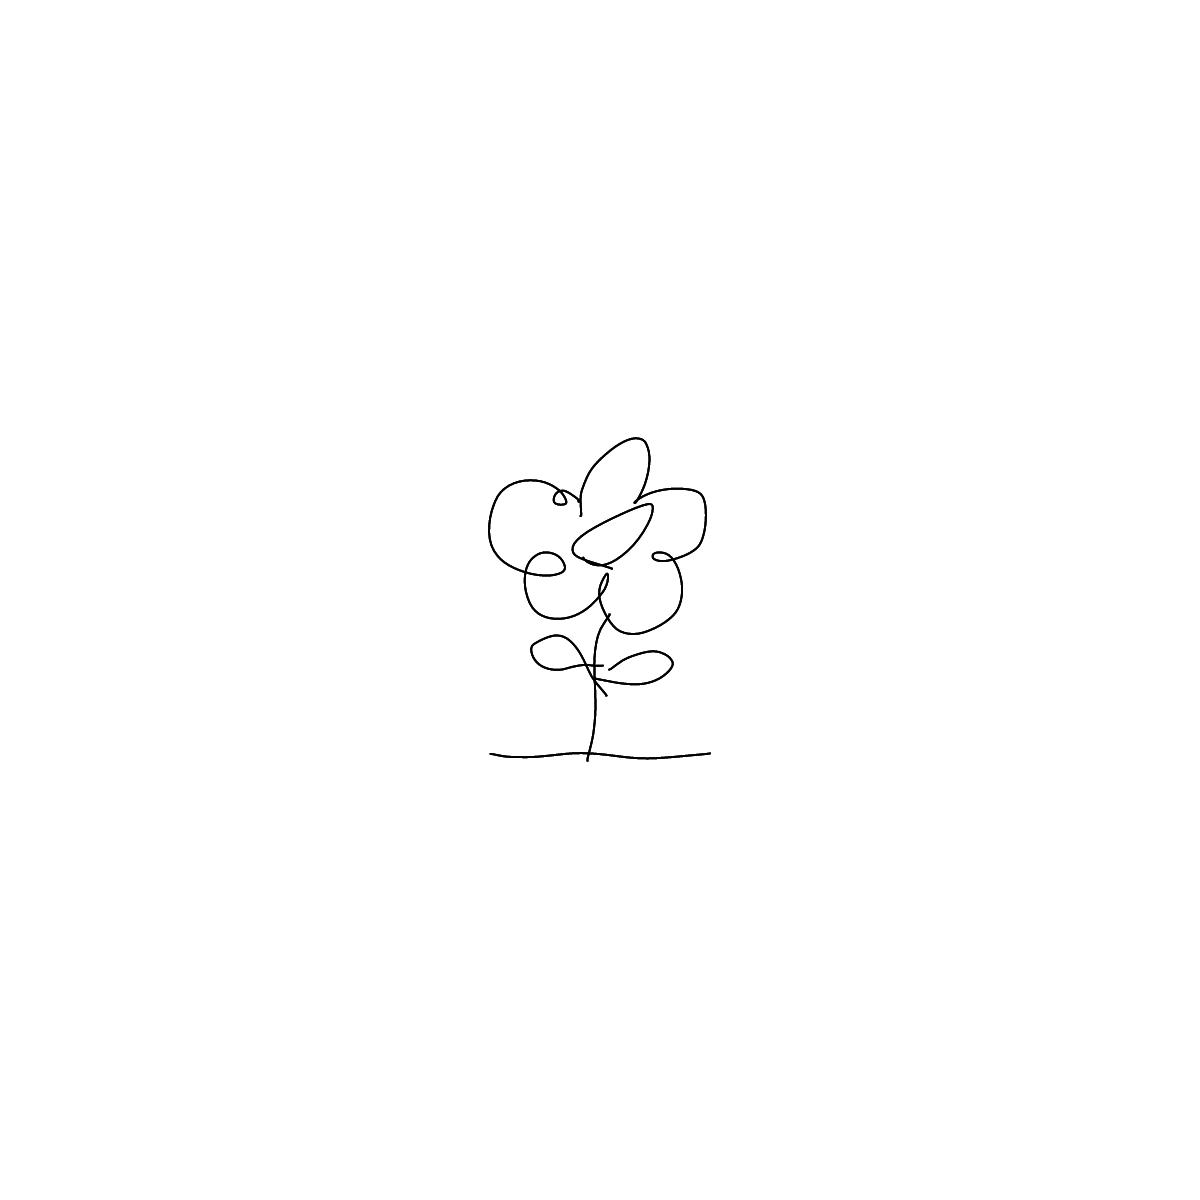 BAAAM drawing#19579 lat:32.0643348693847660lng: 34.8166084289550800